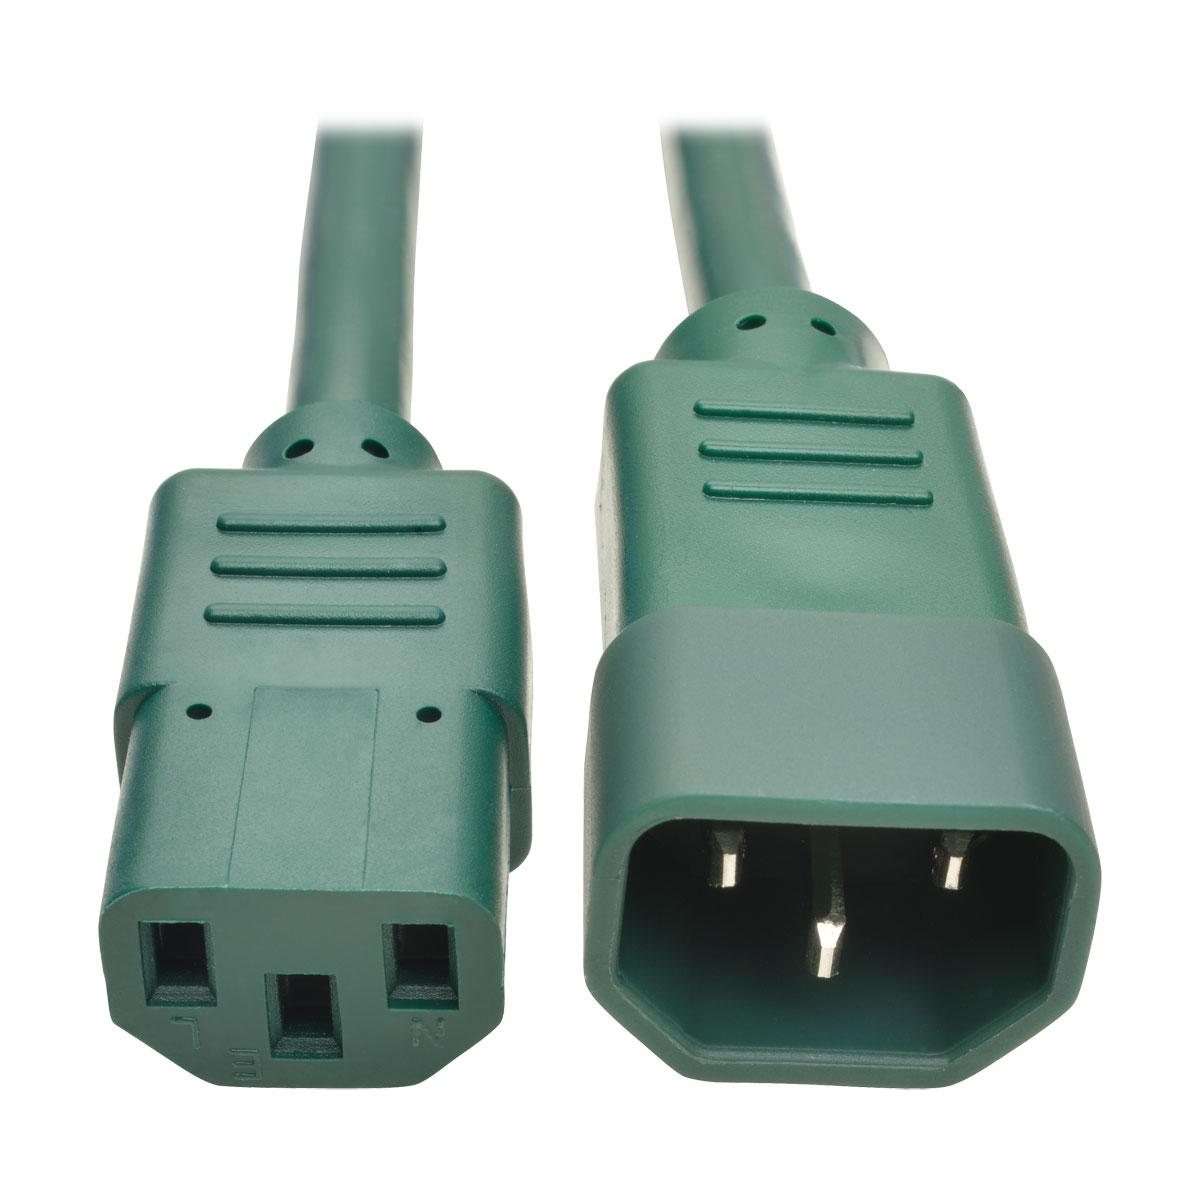 Green Power Cable : Tripp lite p agn m c coupler green